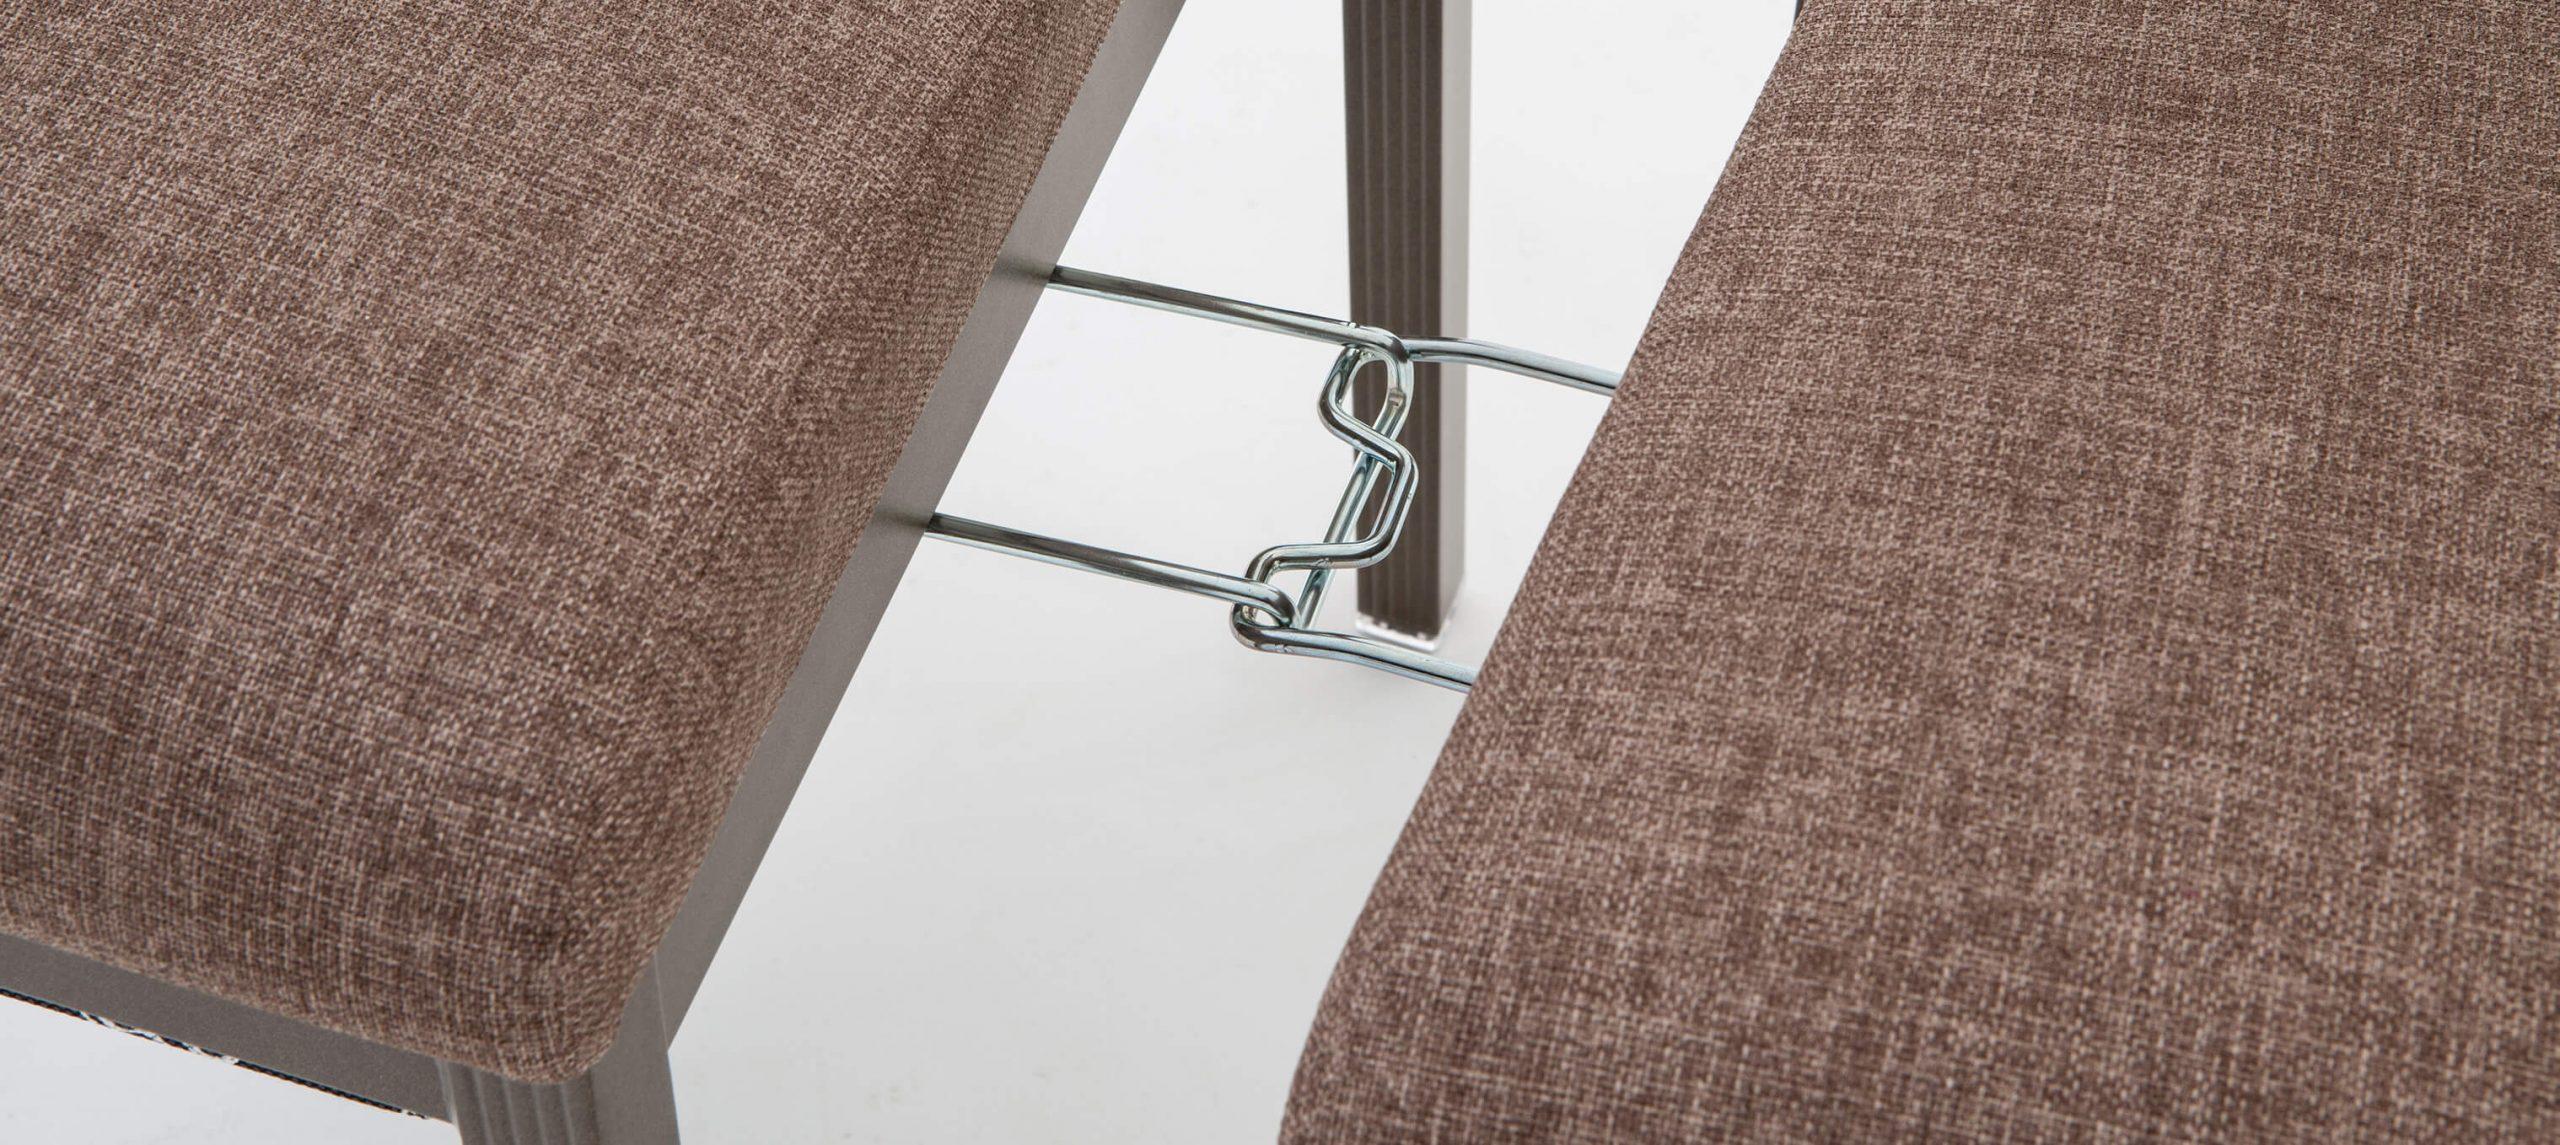 Salon Chair Clips - Close Up 1500x1671